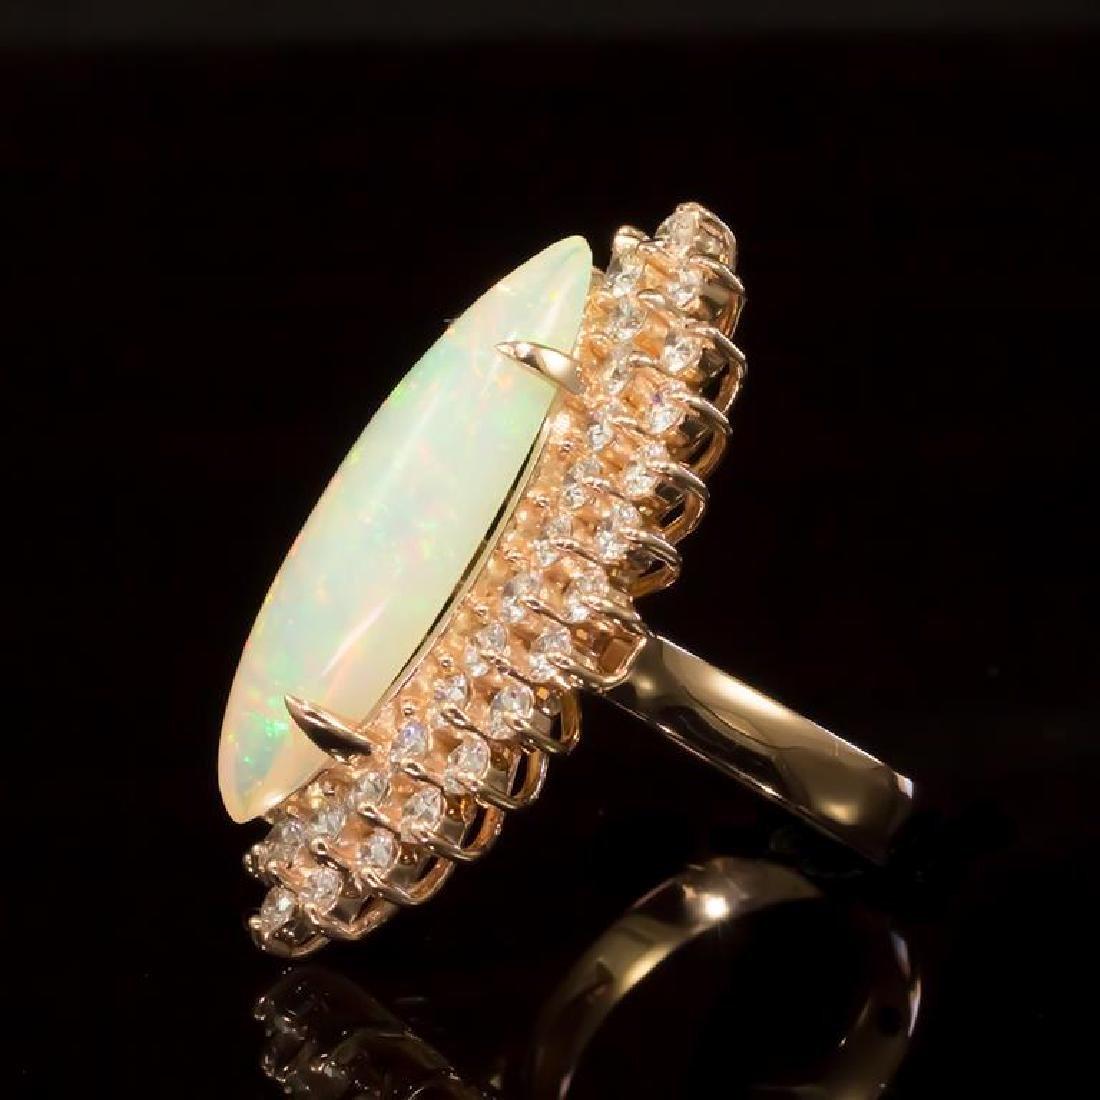 14K Gold 5,33ct Opal 2.85ct Diamond Ring - 2